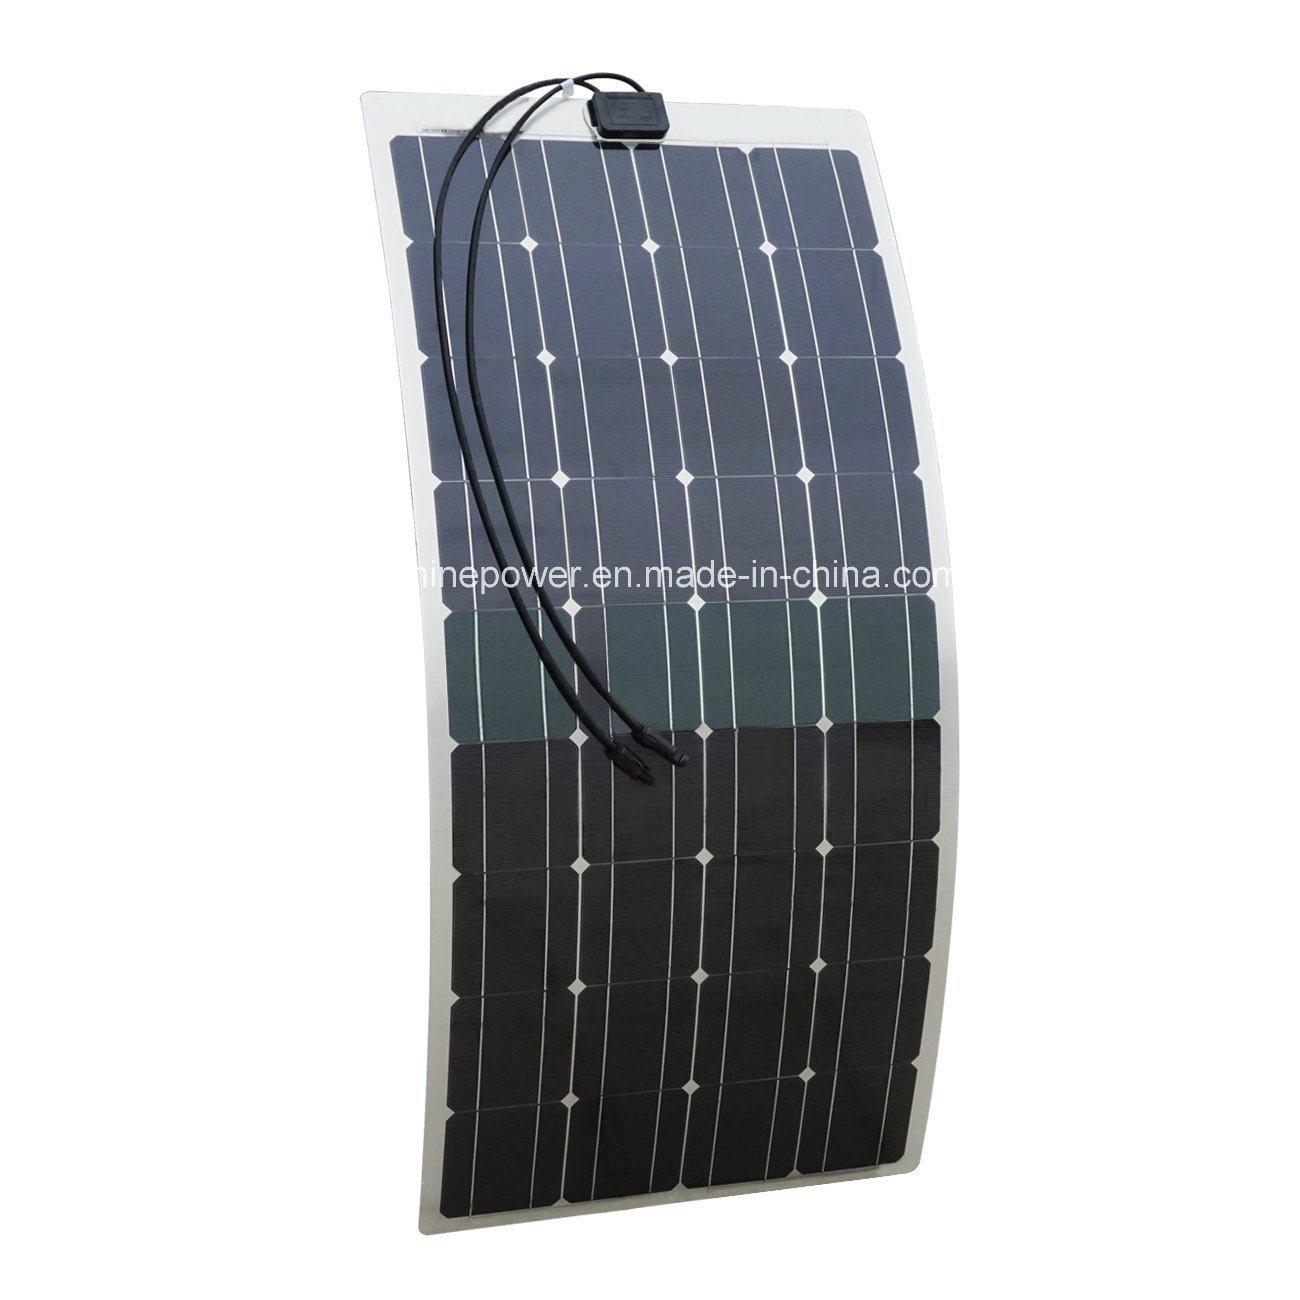 100W Semi-Flexible Solar Panel for Camper RV Yacht Home